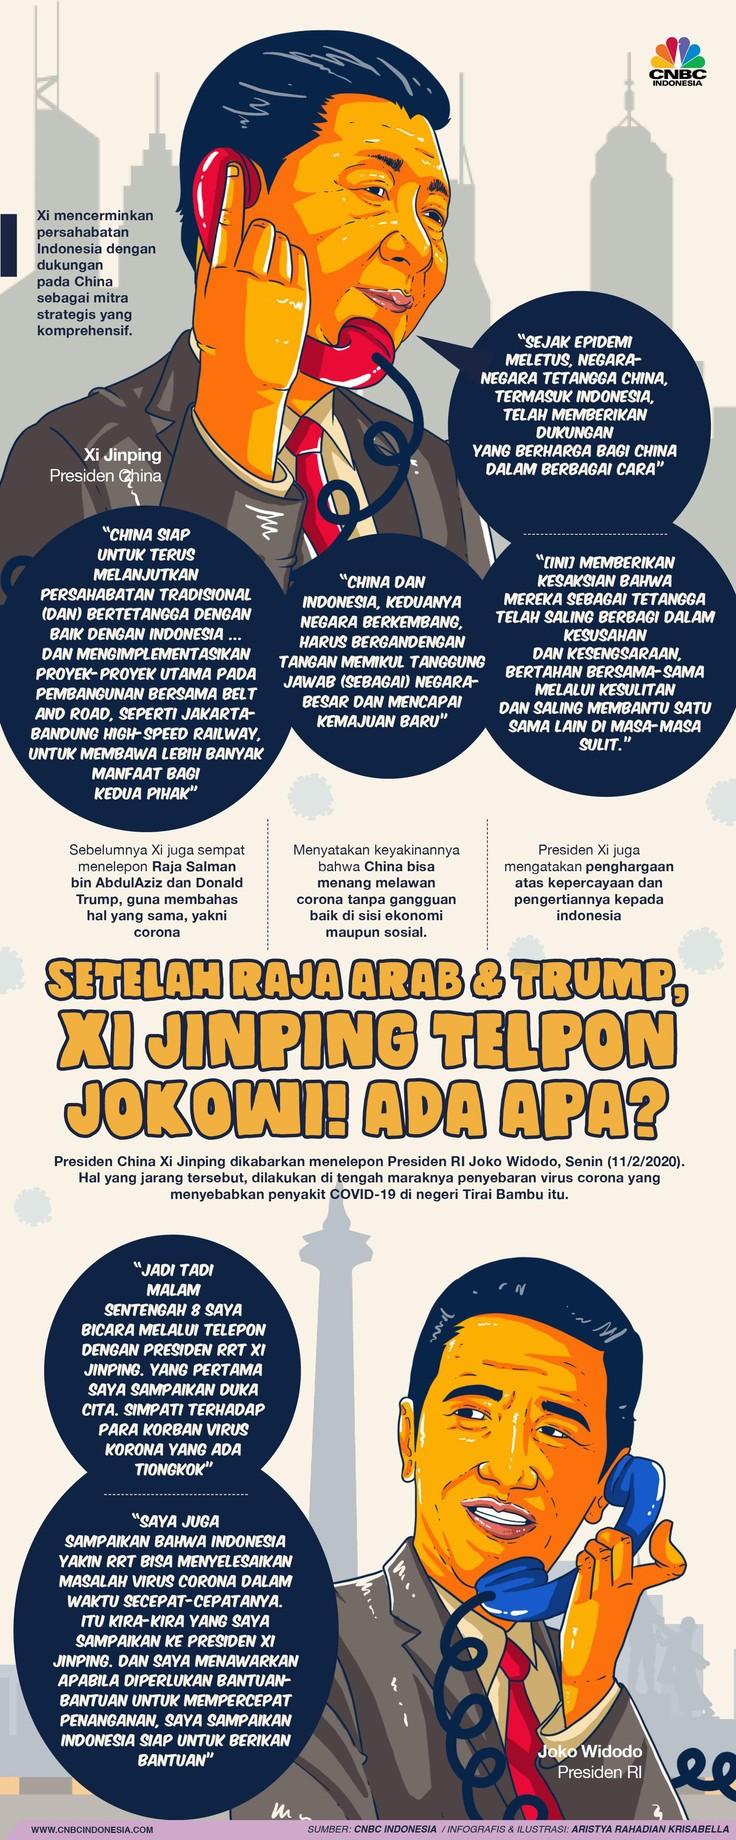 Jokowi dan Xi Jinping Ngobrol via Telepon, Bahas Apa?